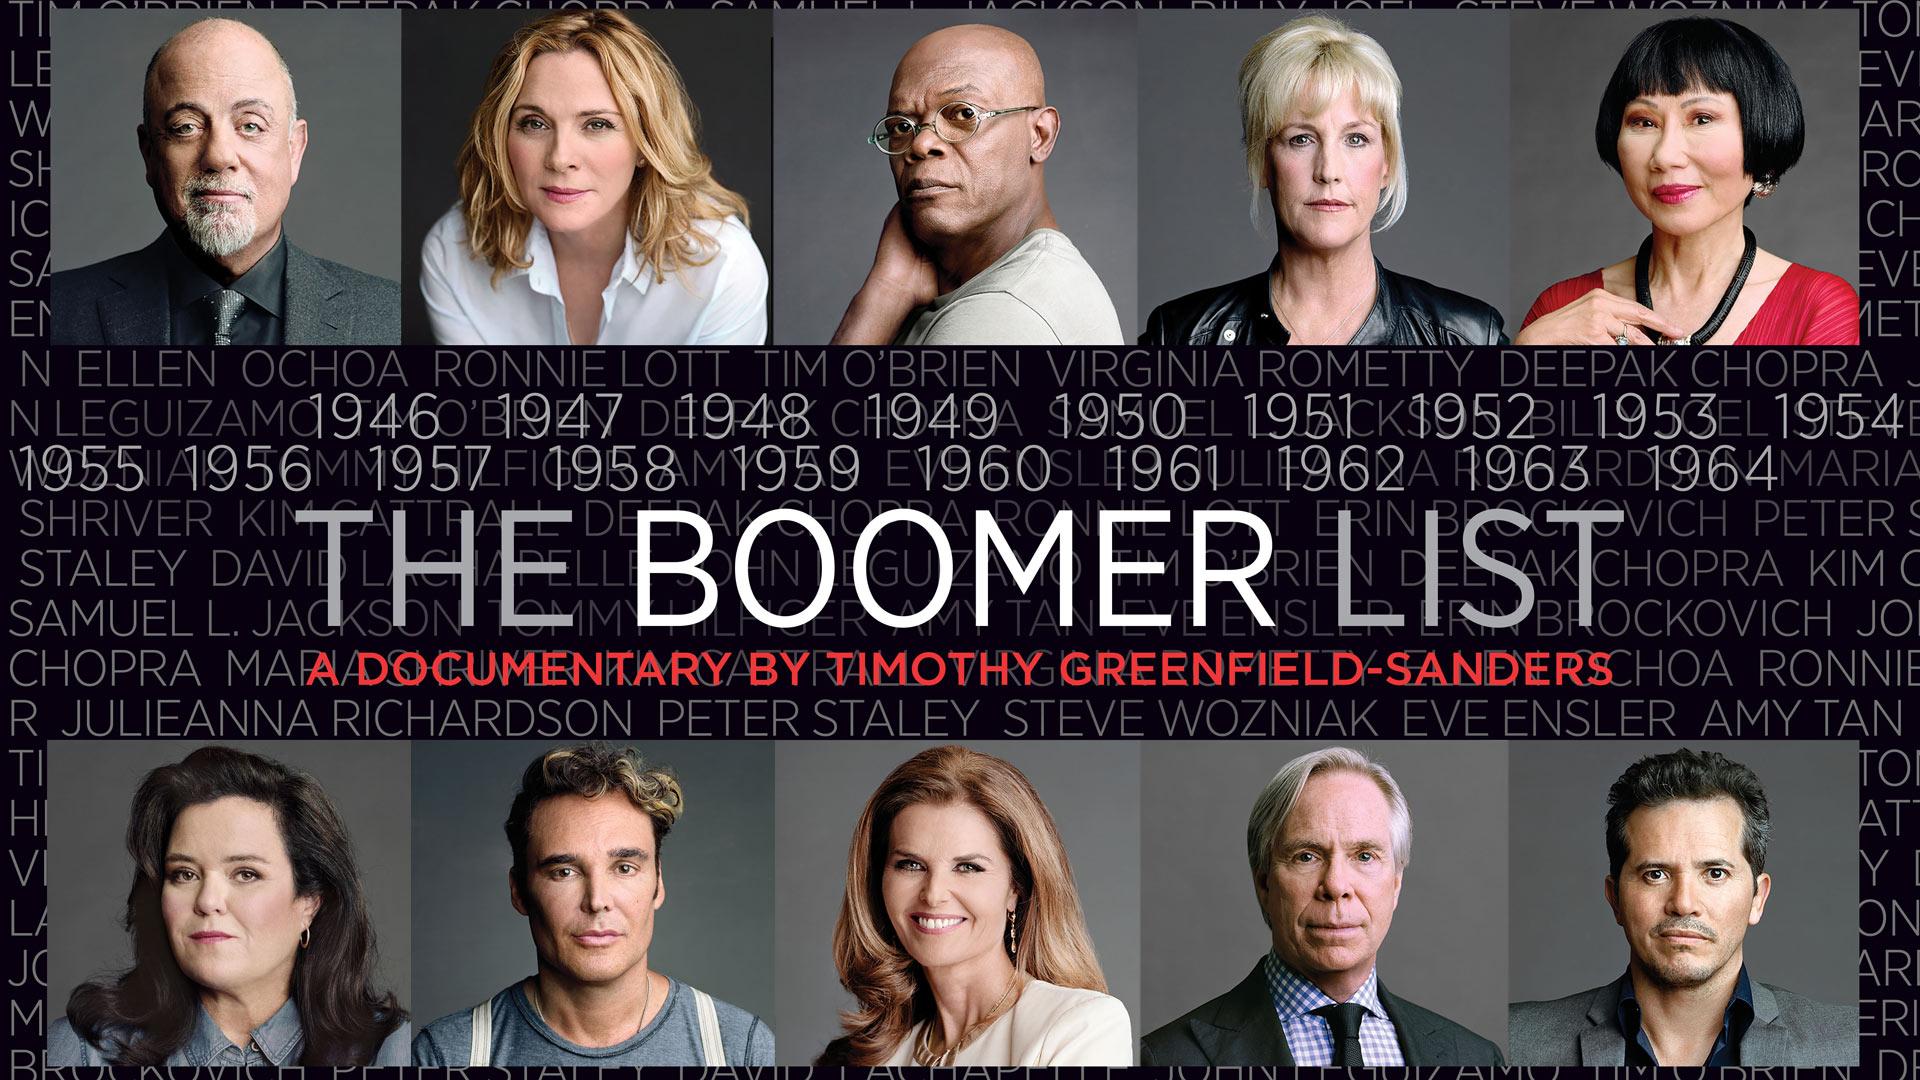 boomers - photo #36